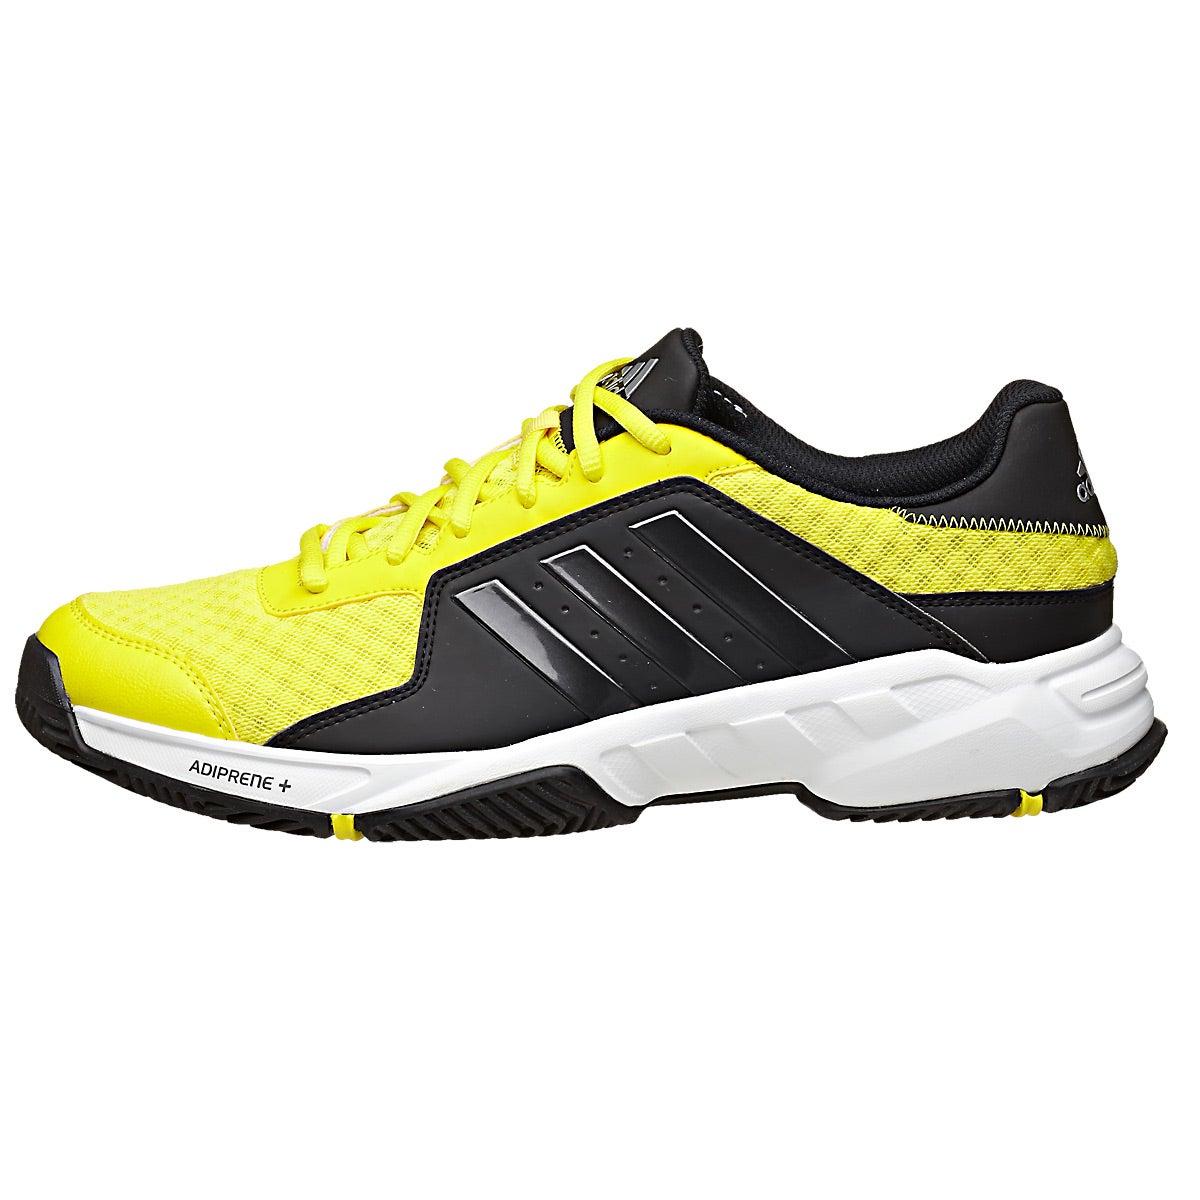 Tennis Shoe Warehouse